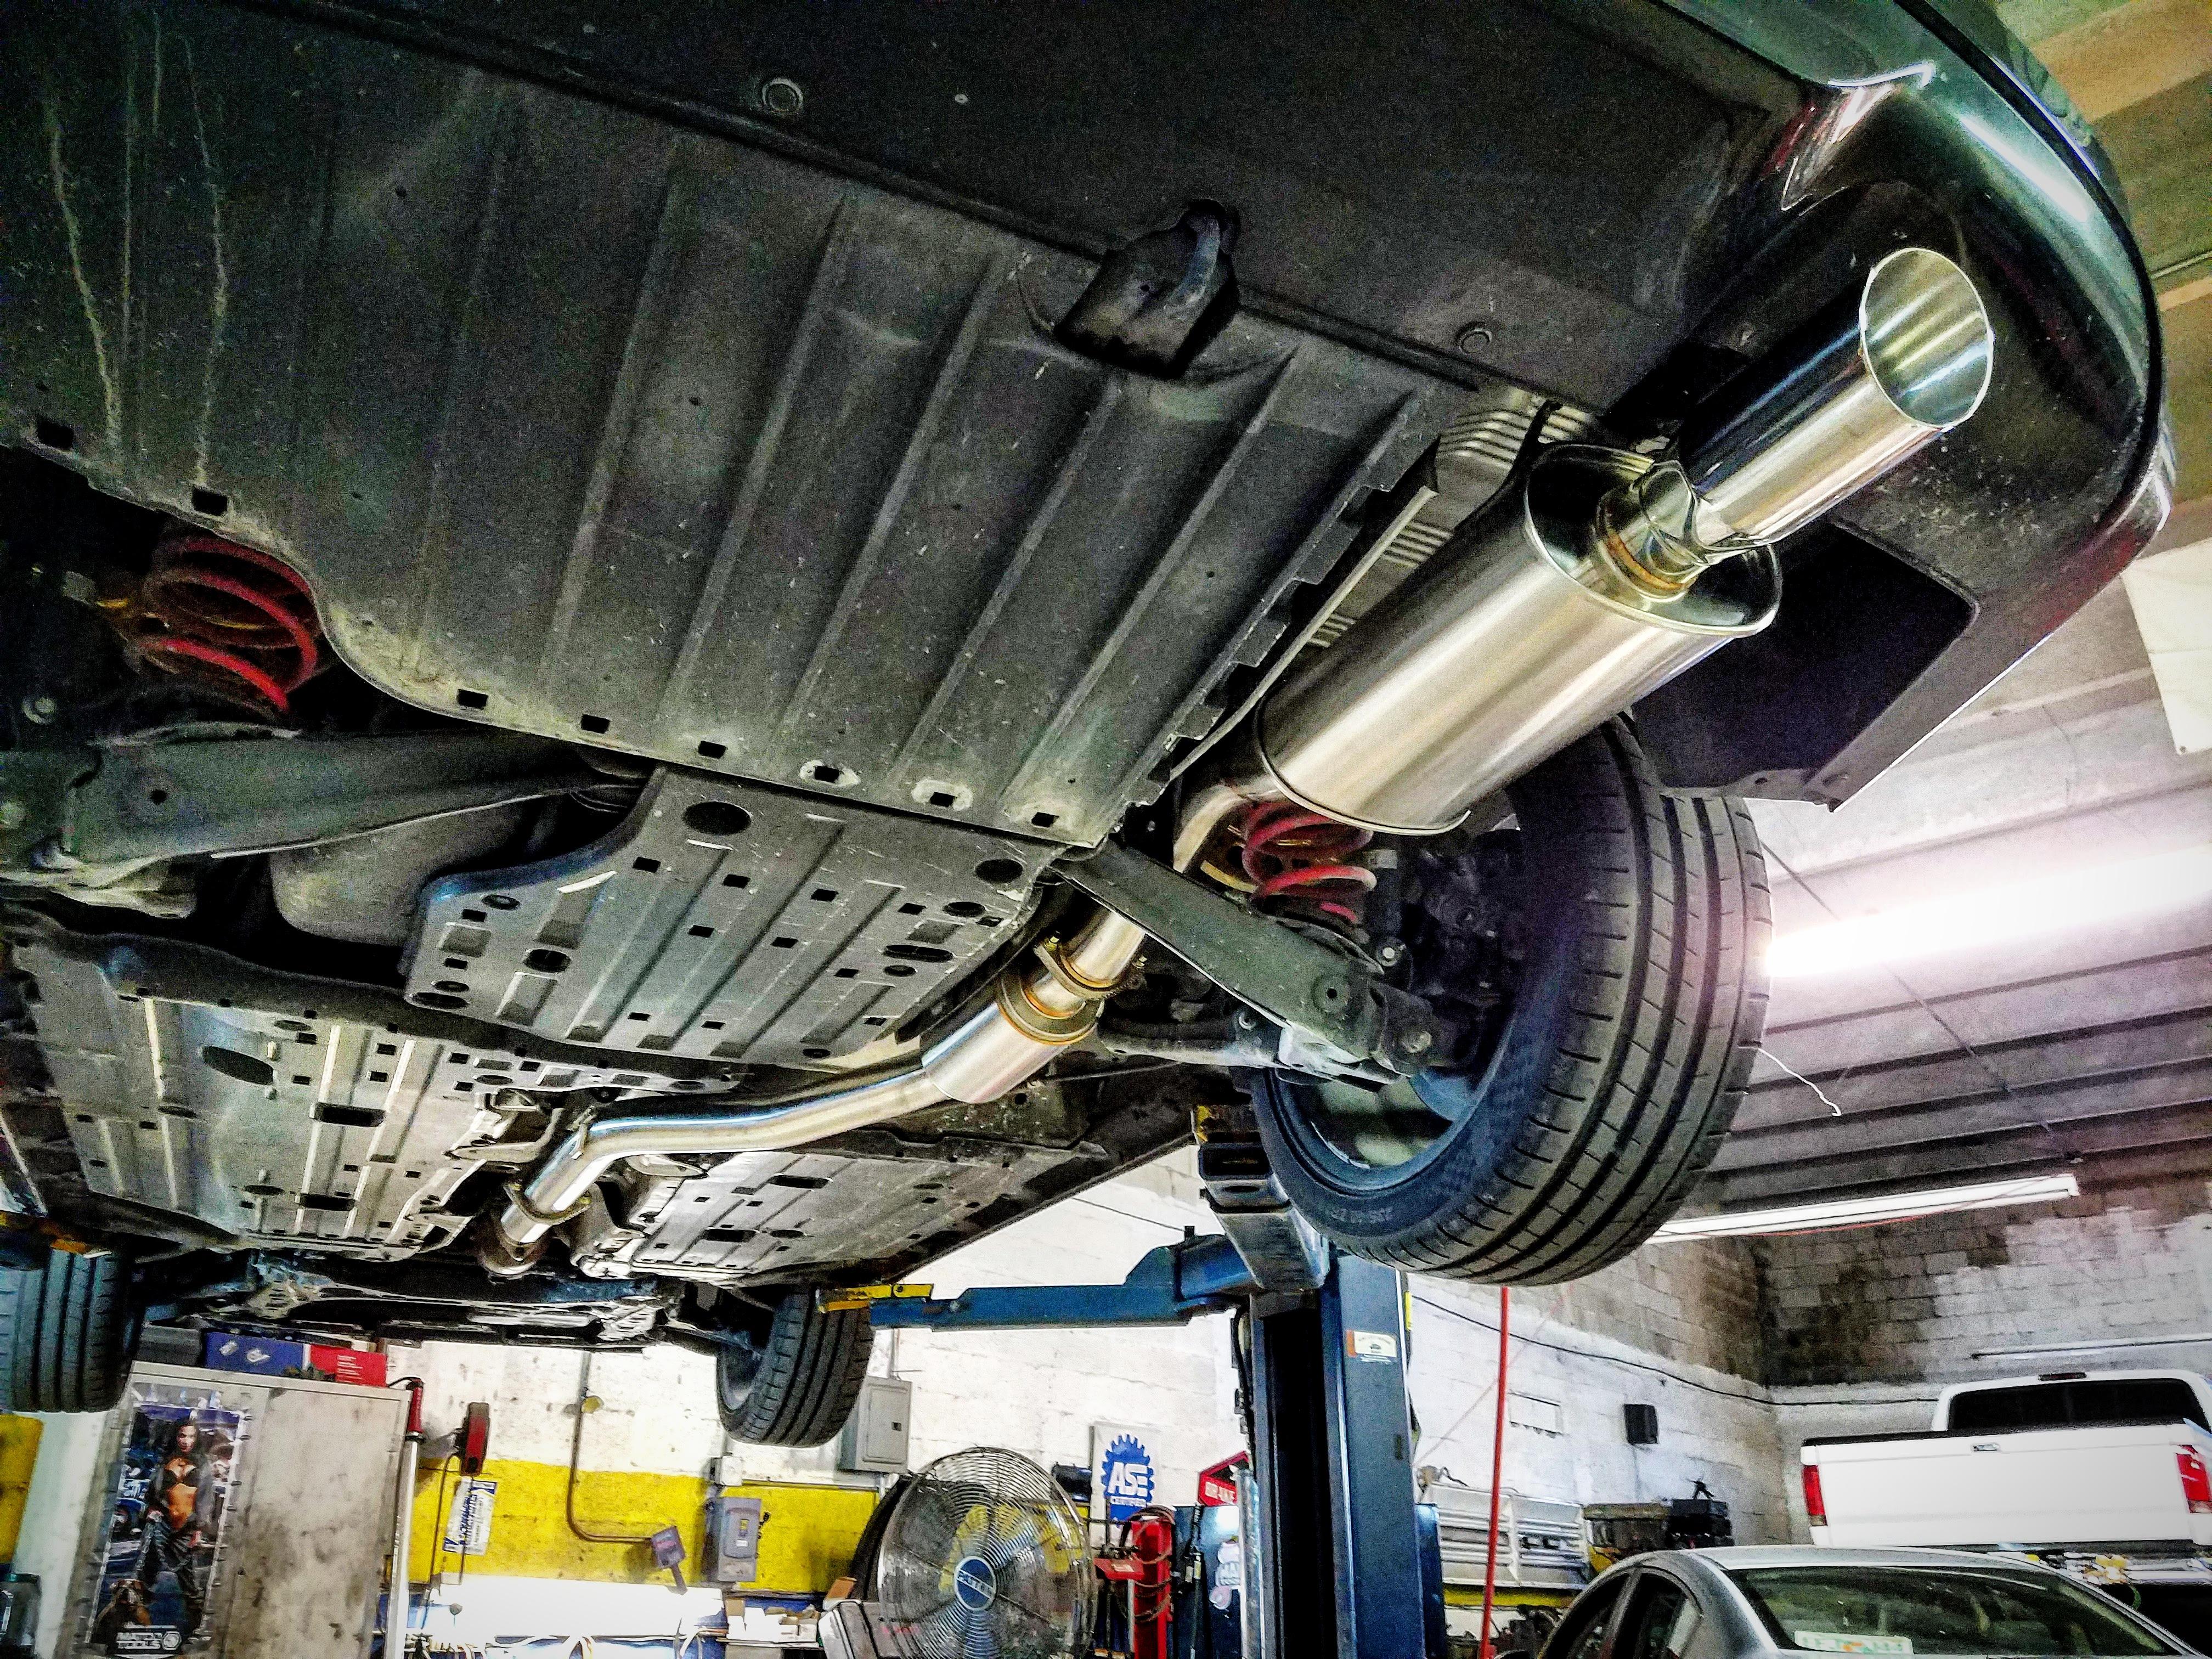 9th Gen Civic Si 3 Quot Exhaust